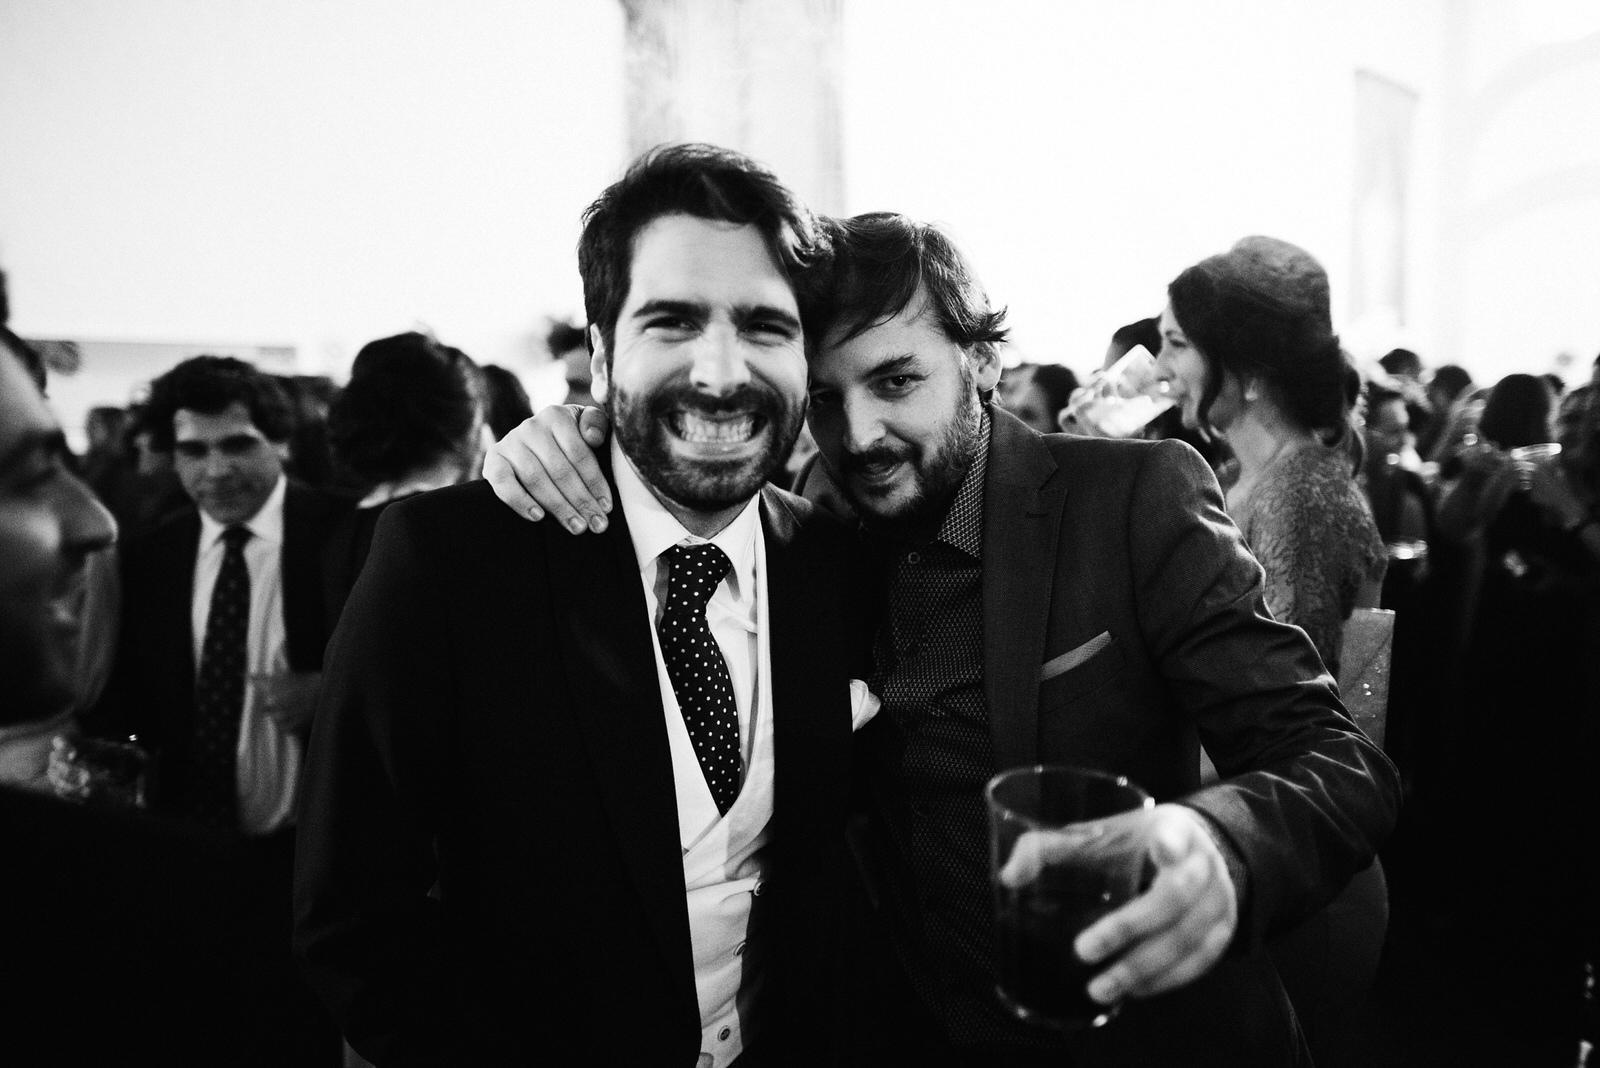 fotografo de bodas sevilla - fotografo boda - fotografía sevilla - Andrés AmarilloAAA_3750- fine.JPG